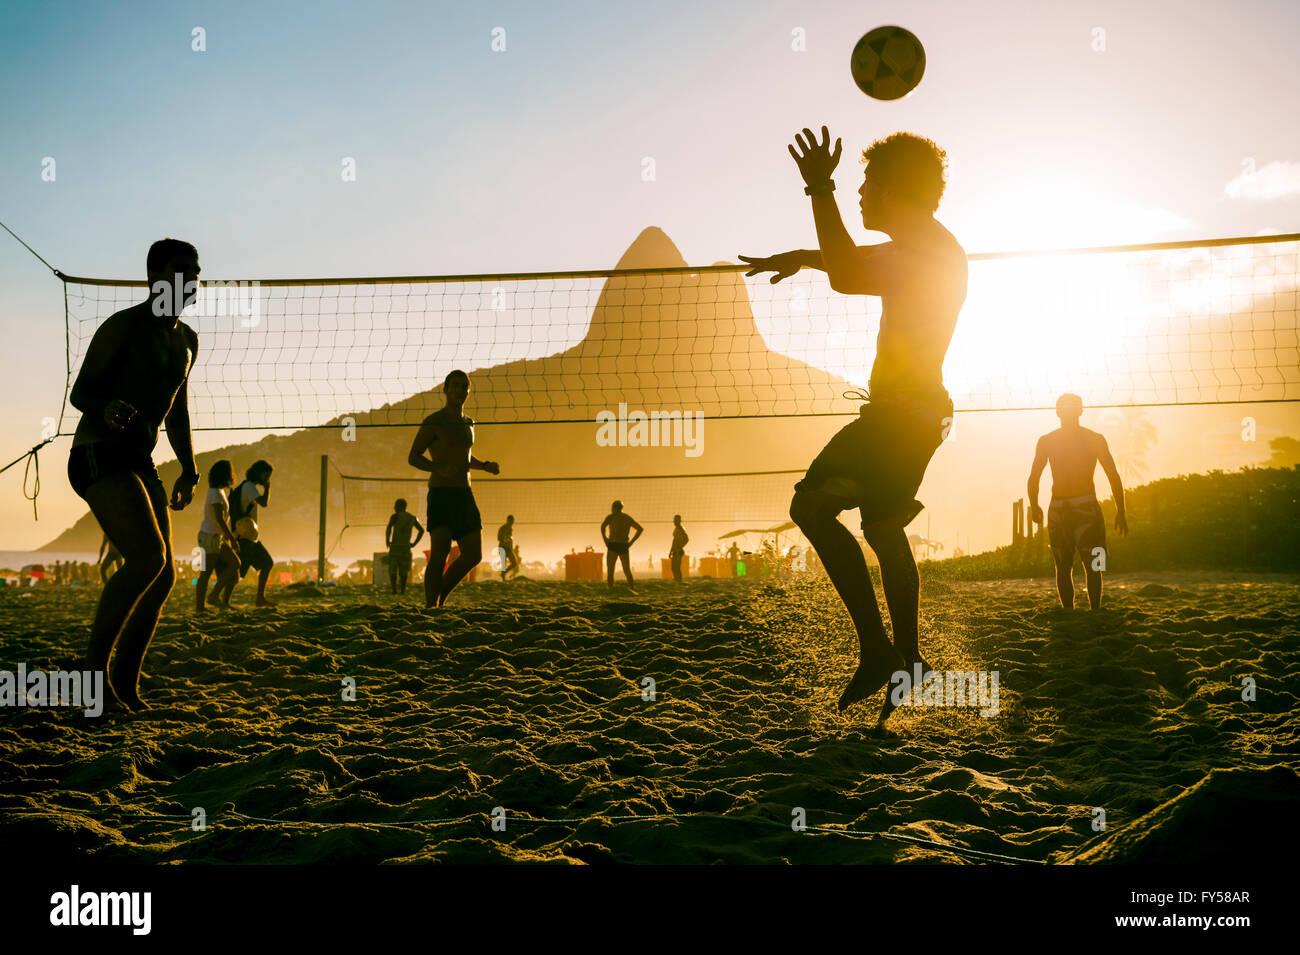 RIO DE JANEIRO - le 27 mars 2016: Les Brésiliens jouer beach (futevolei footvolley), combinant le football Photo Stock